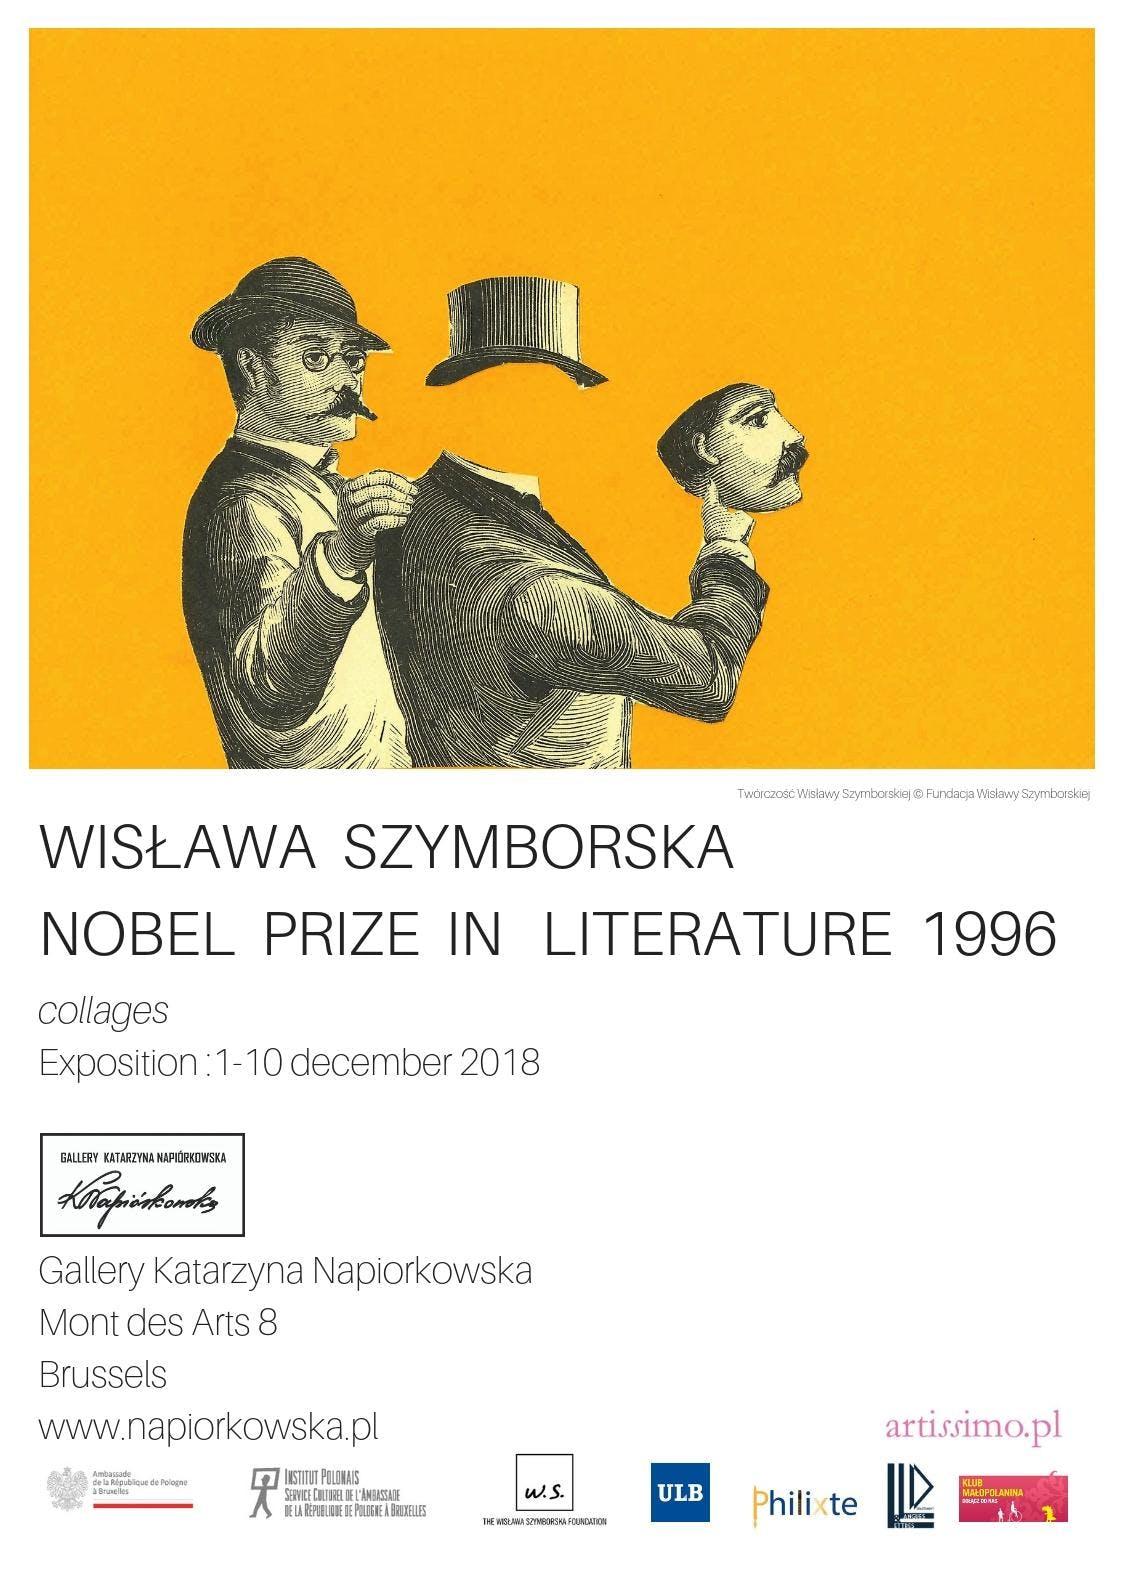 Wislawa Szymborska // Prix Nobel de Litterature // Collages